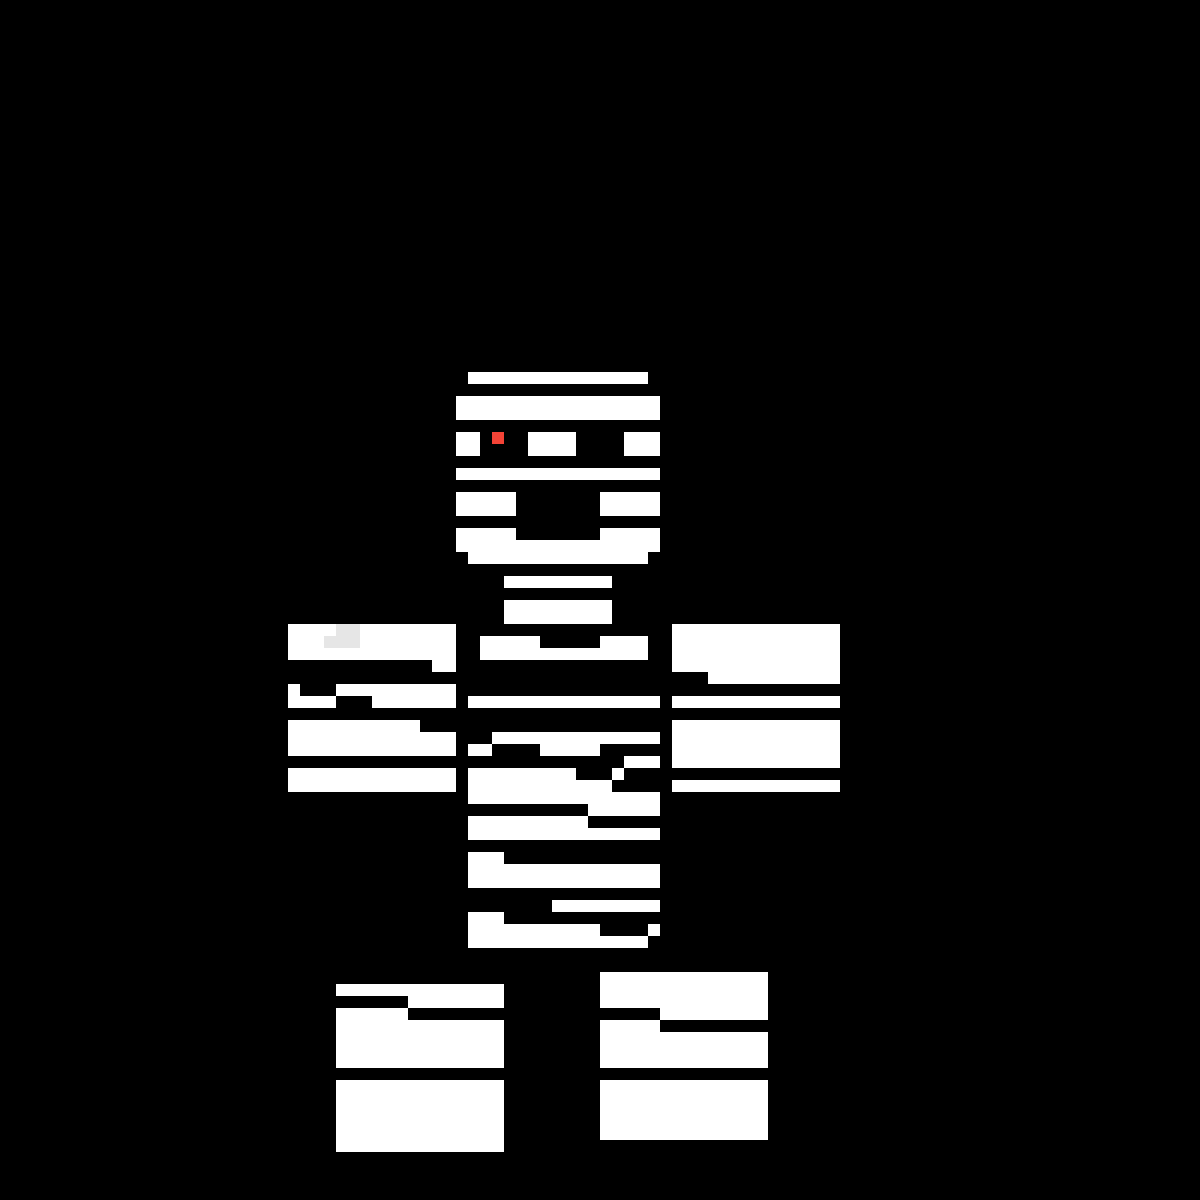 My oc, white dude by PLZU840